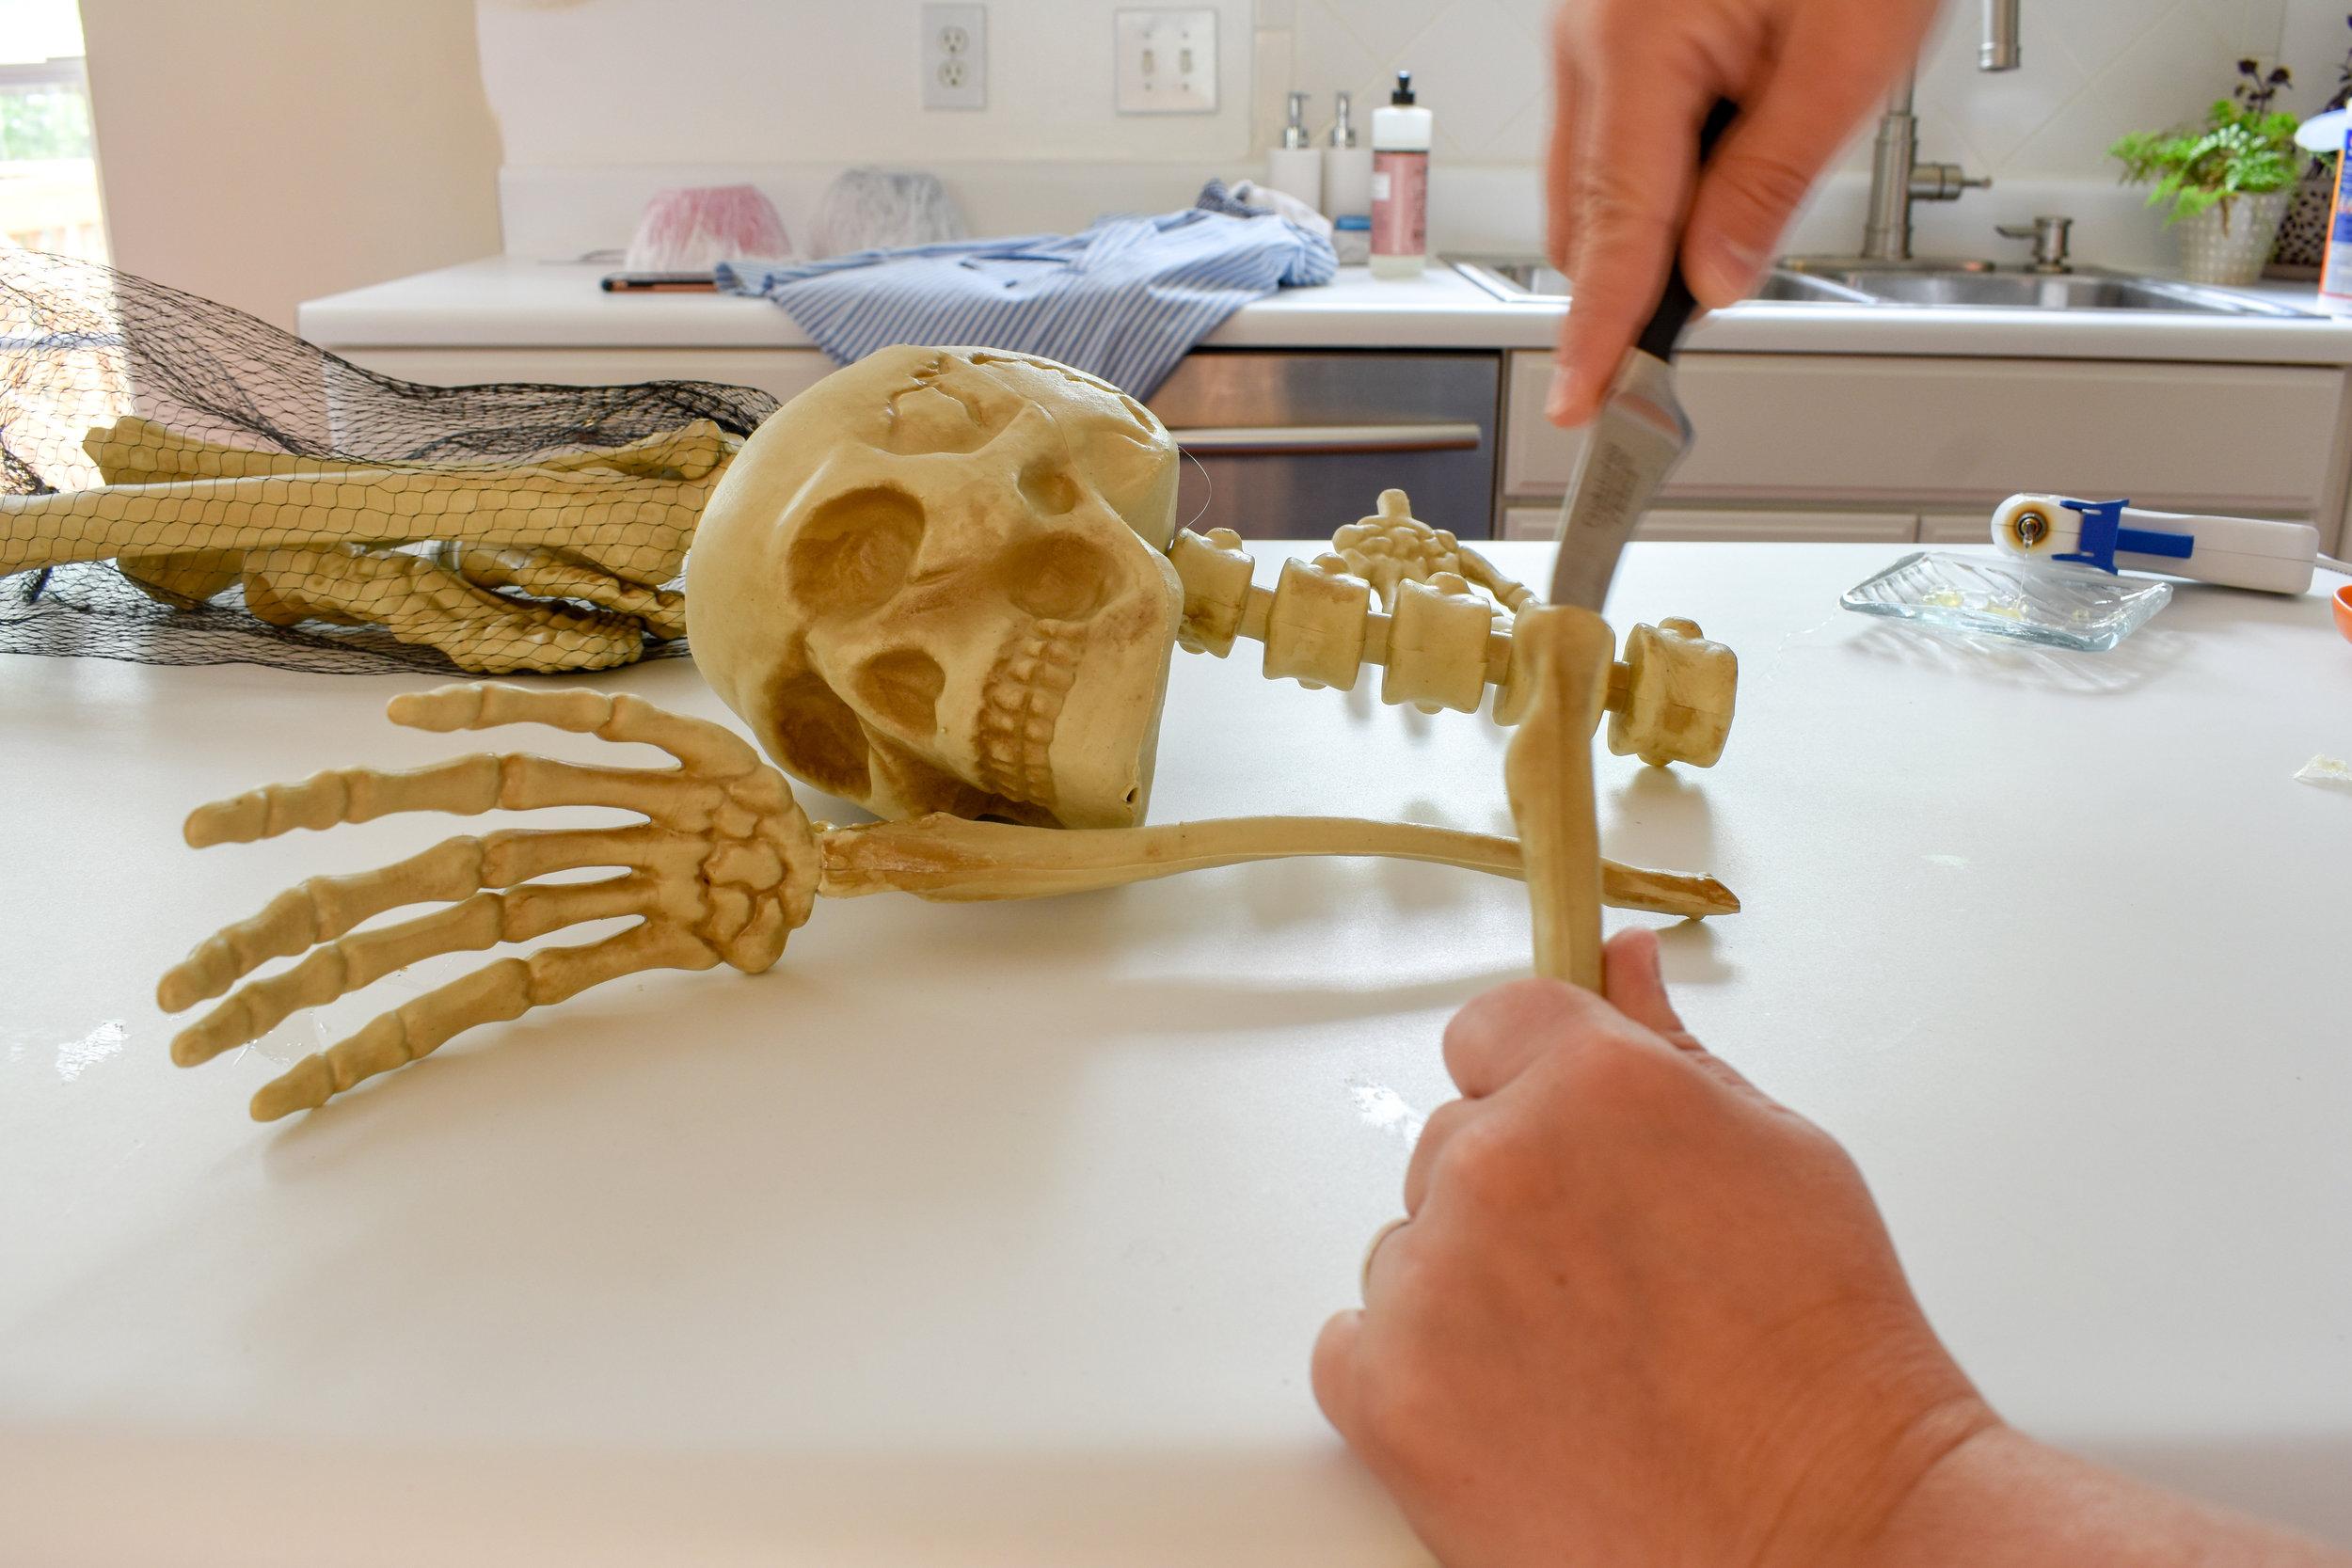 DIY skeleton for Halloween - only $10 for a skeleton bartender